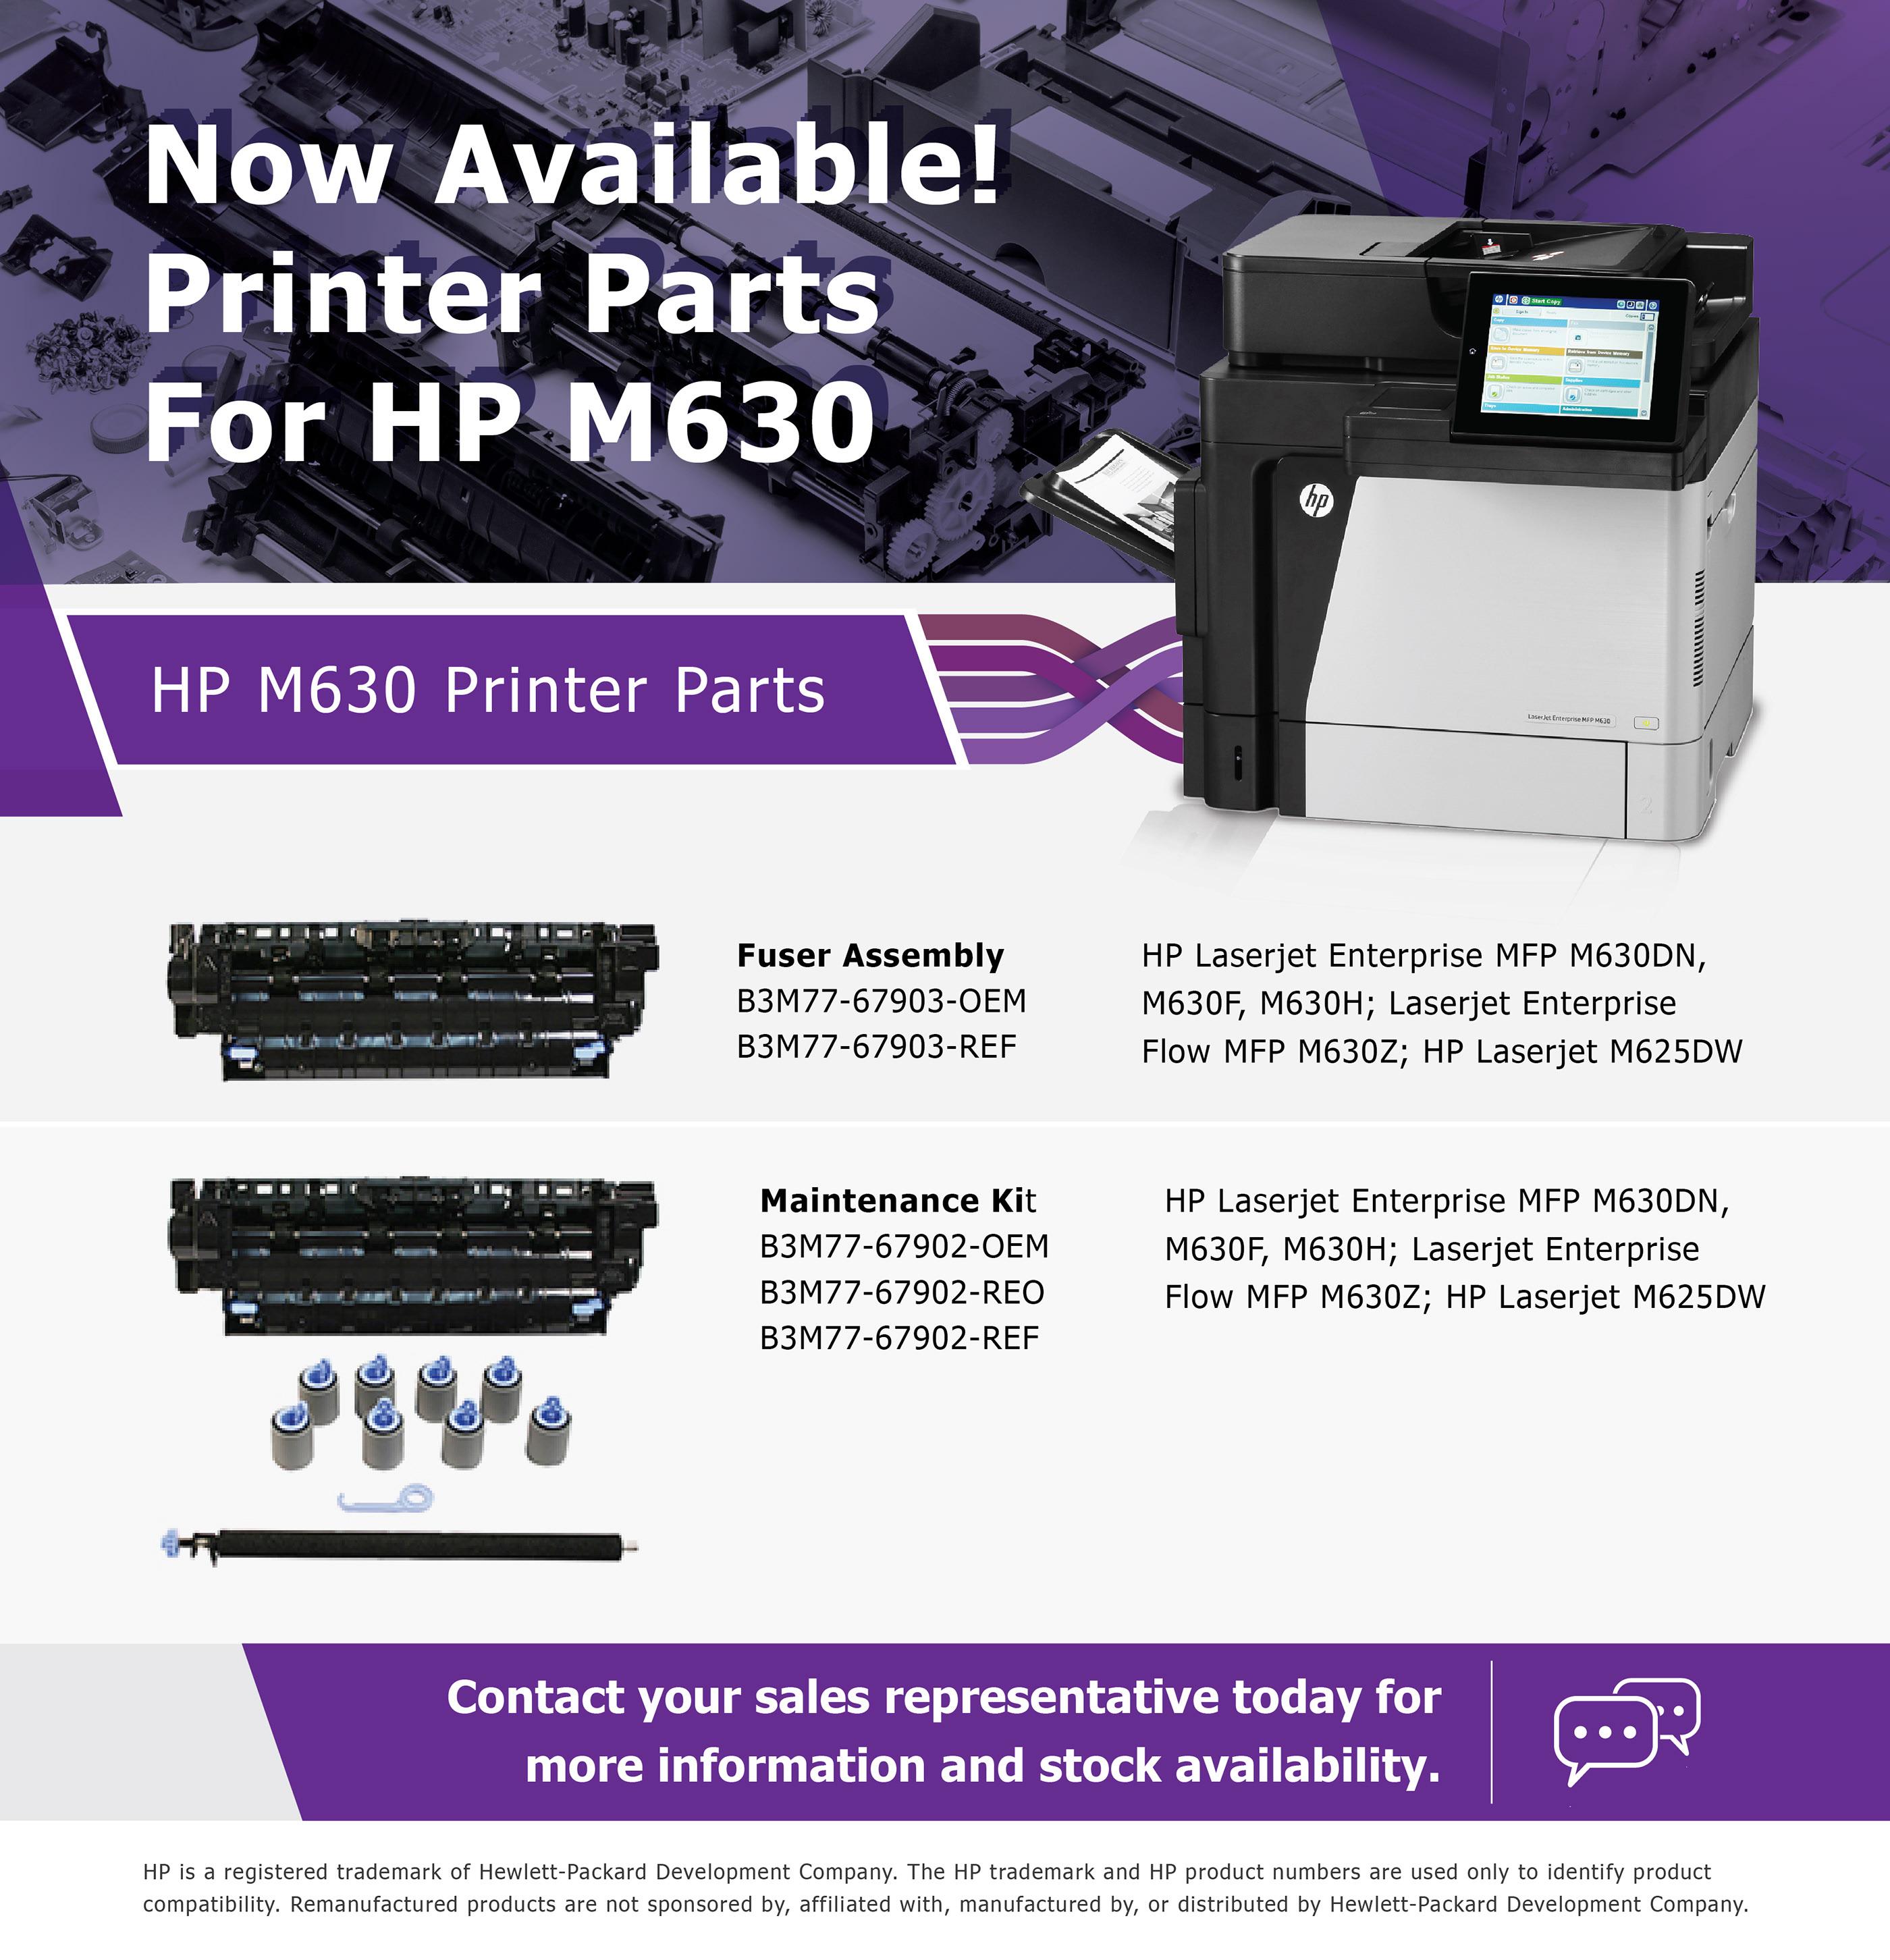 143218A-M630-Printer-Parts-Eshot on Behance